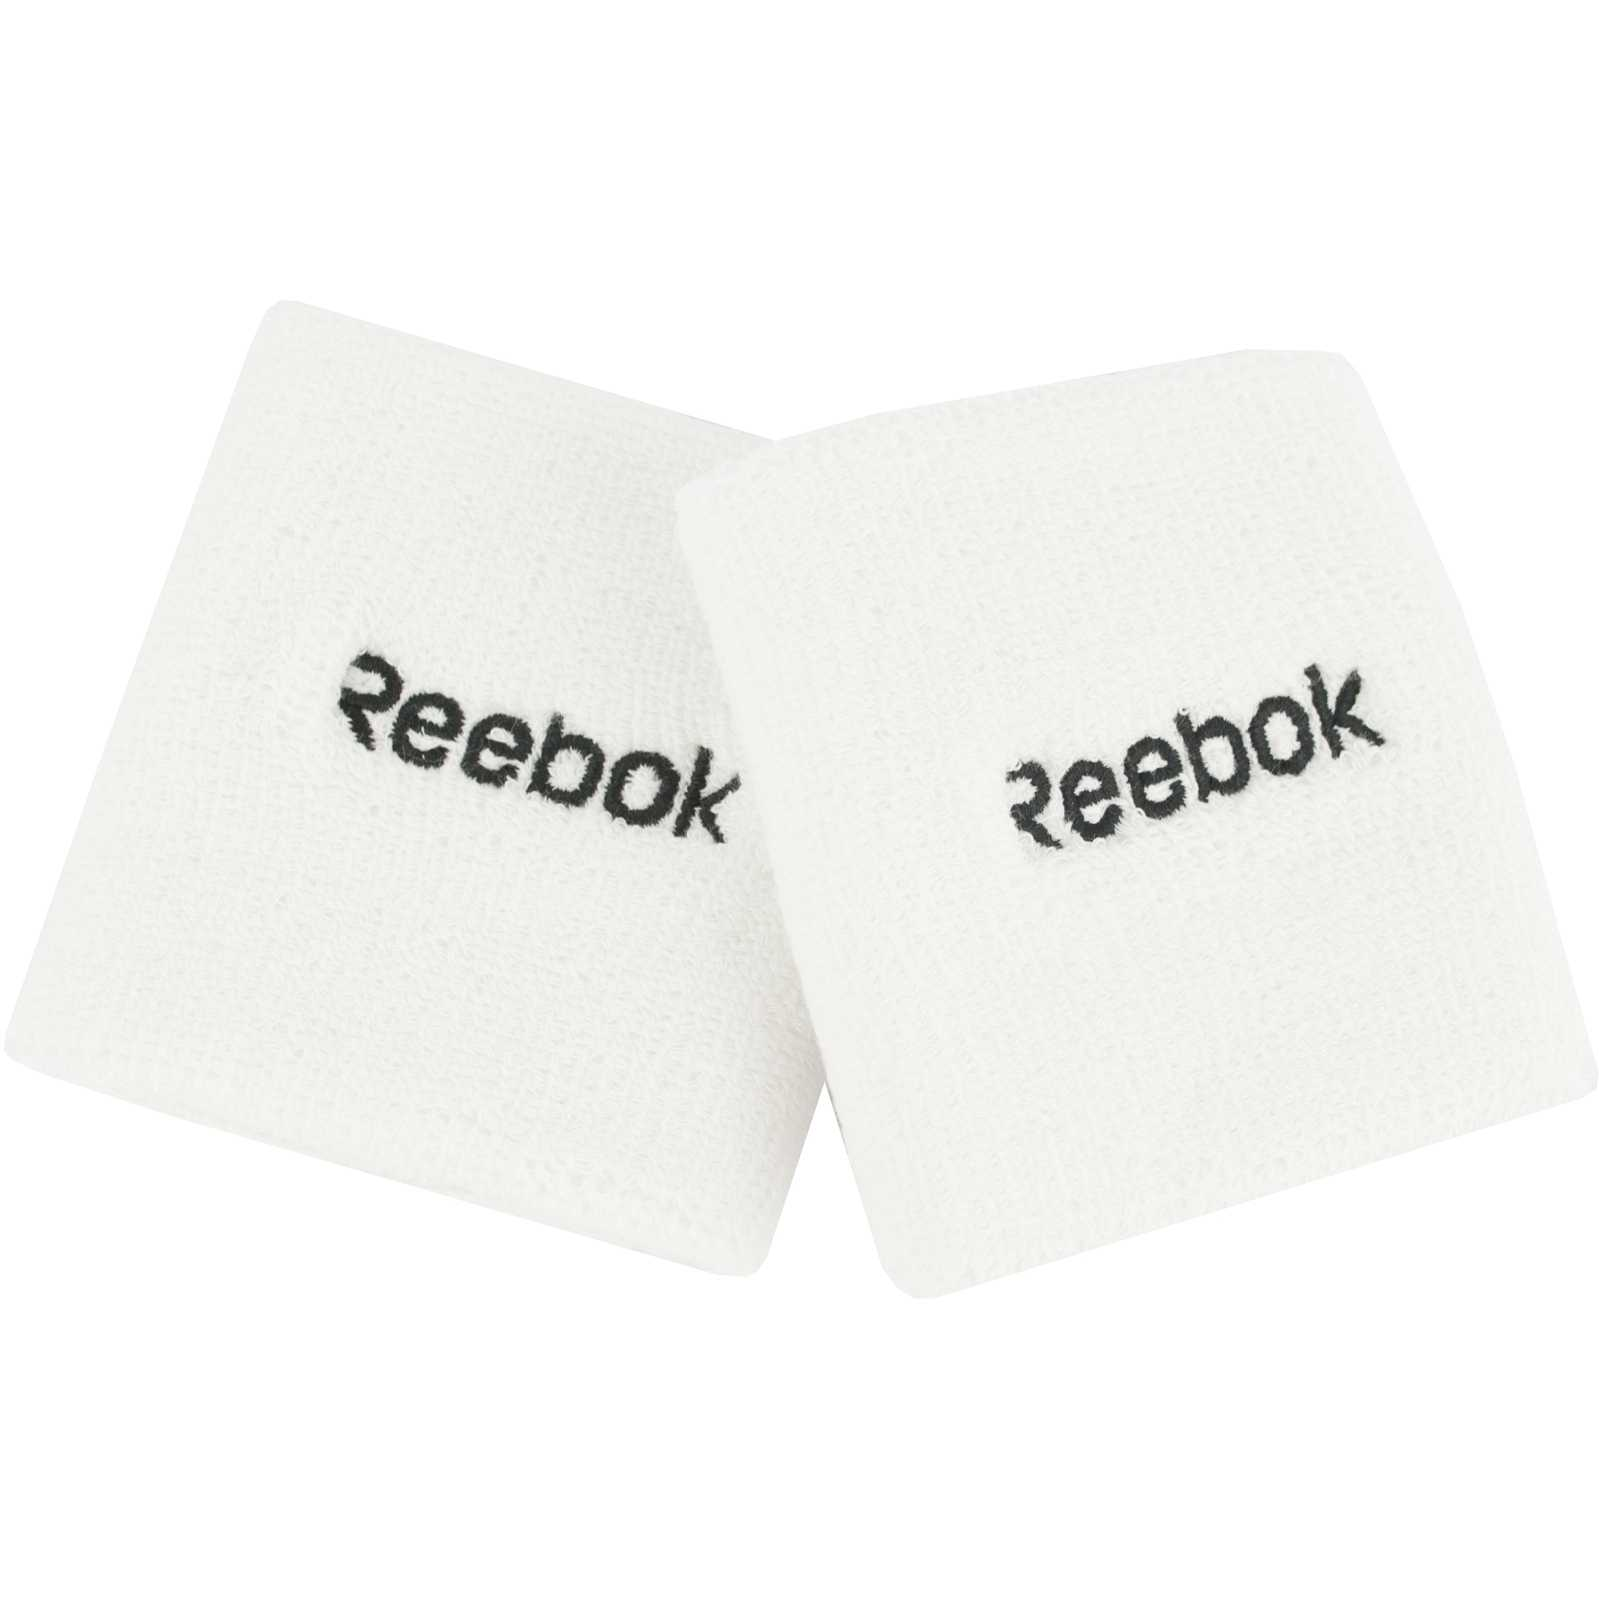 Bandane unisex Reebok 2 PK Wristband K21405